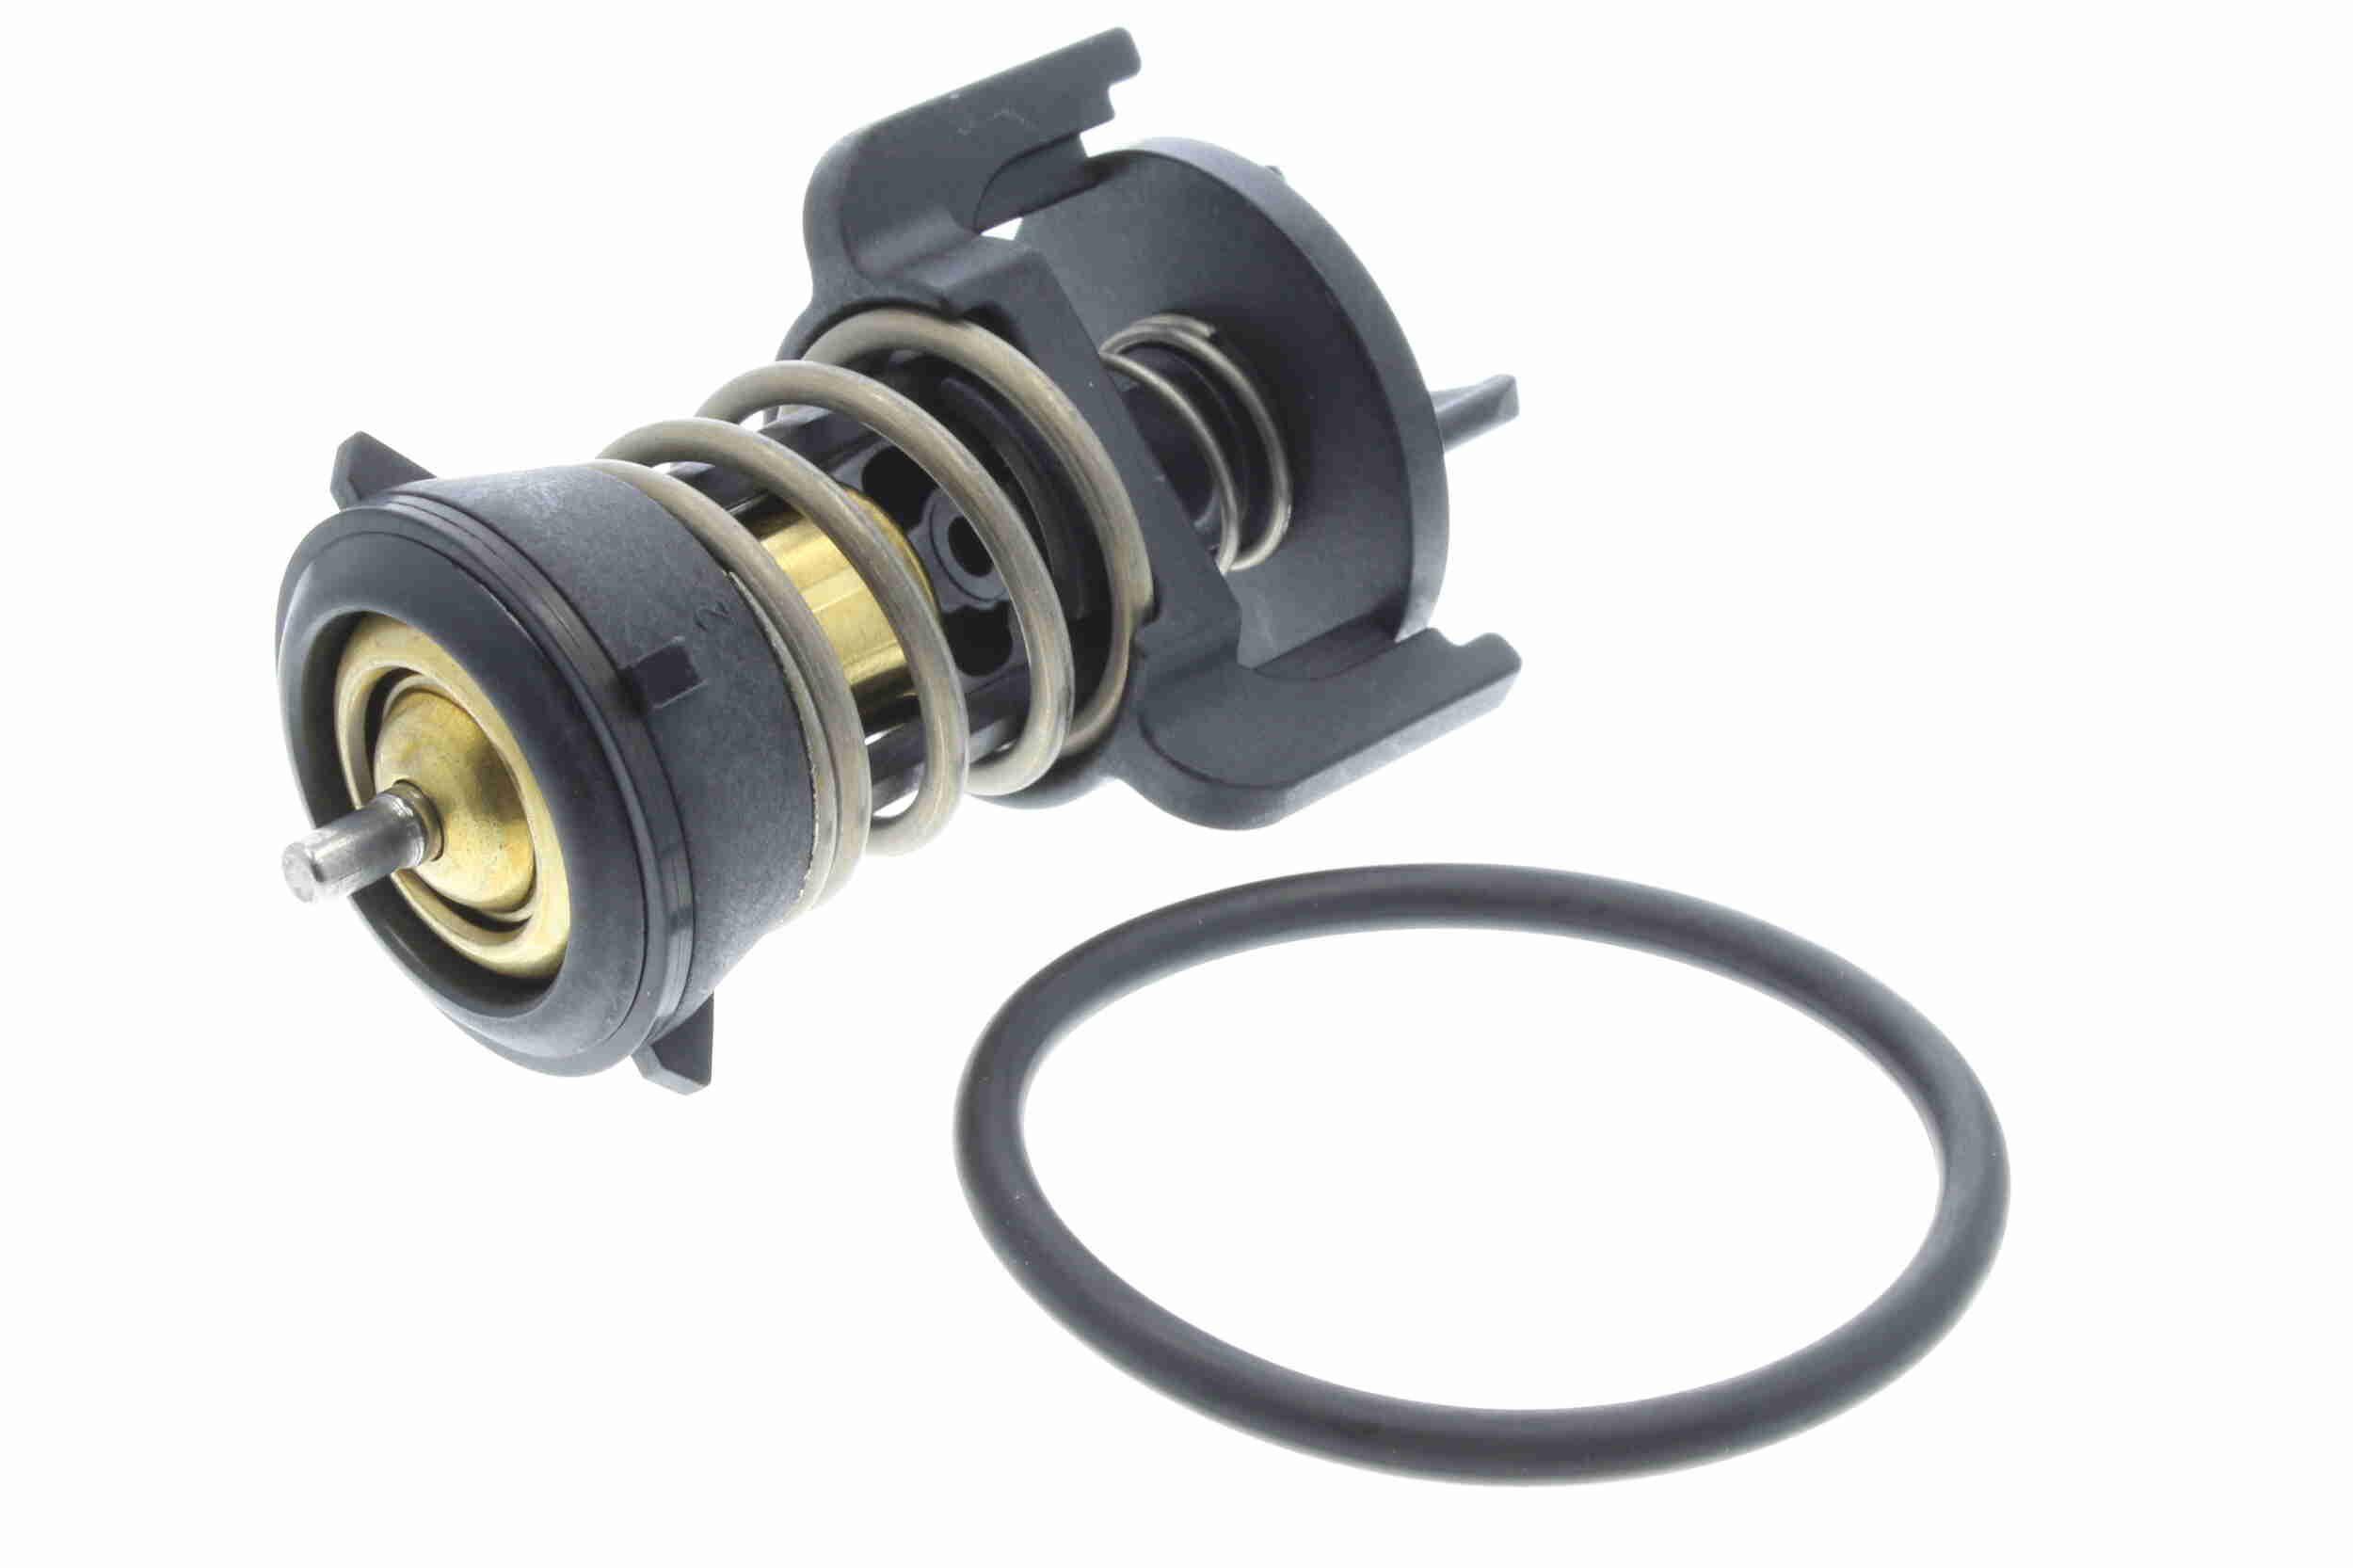 Kühlwasserthermostat V15-99-2100 VEMO V15-99-2100 in Original Qualität